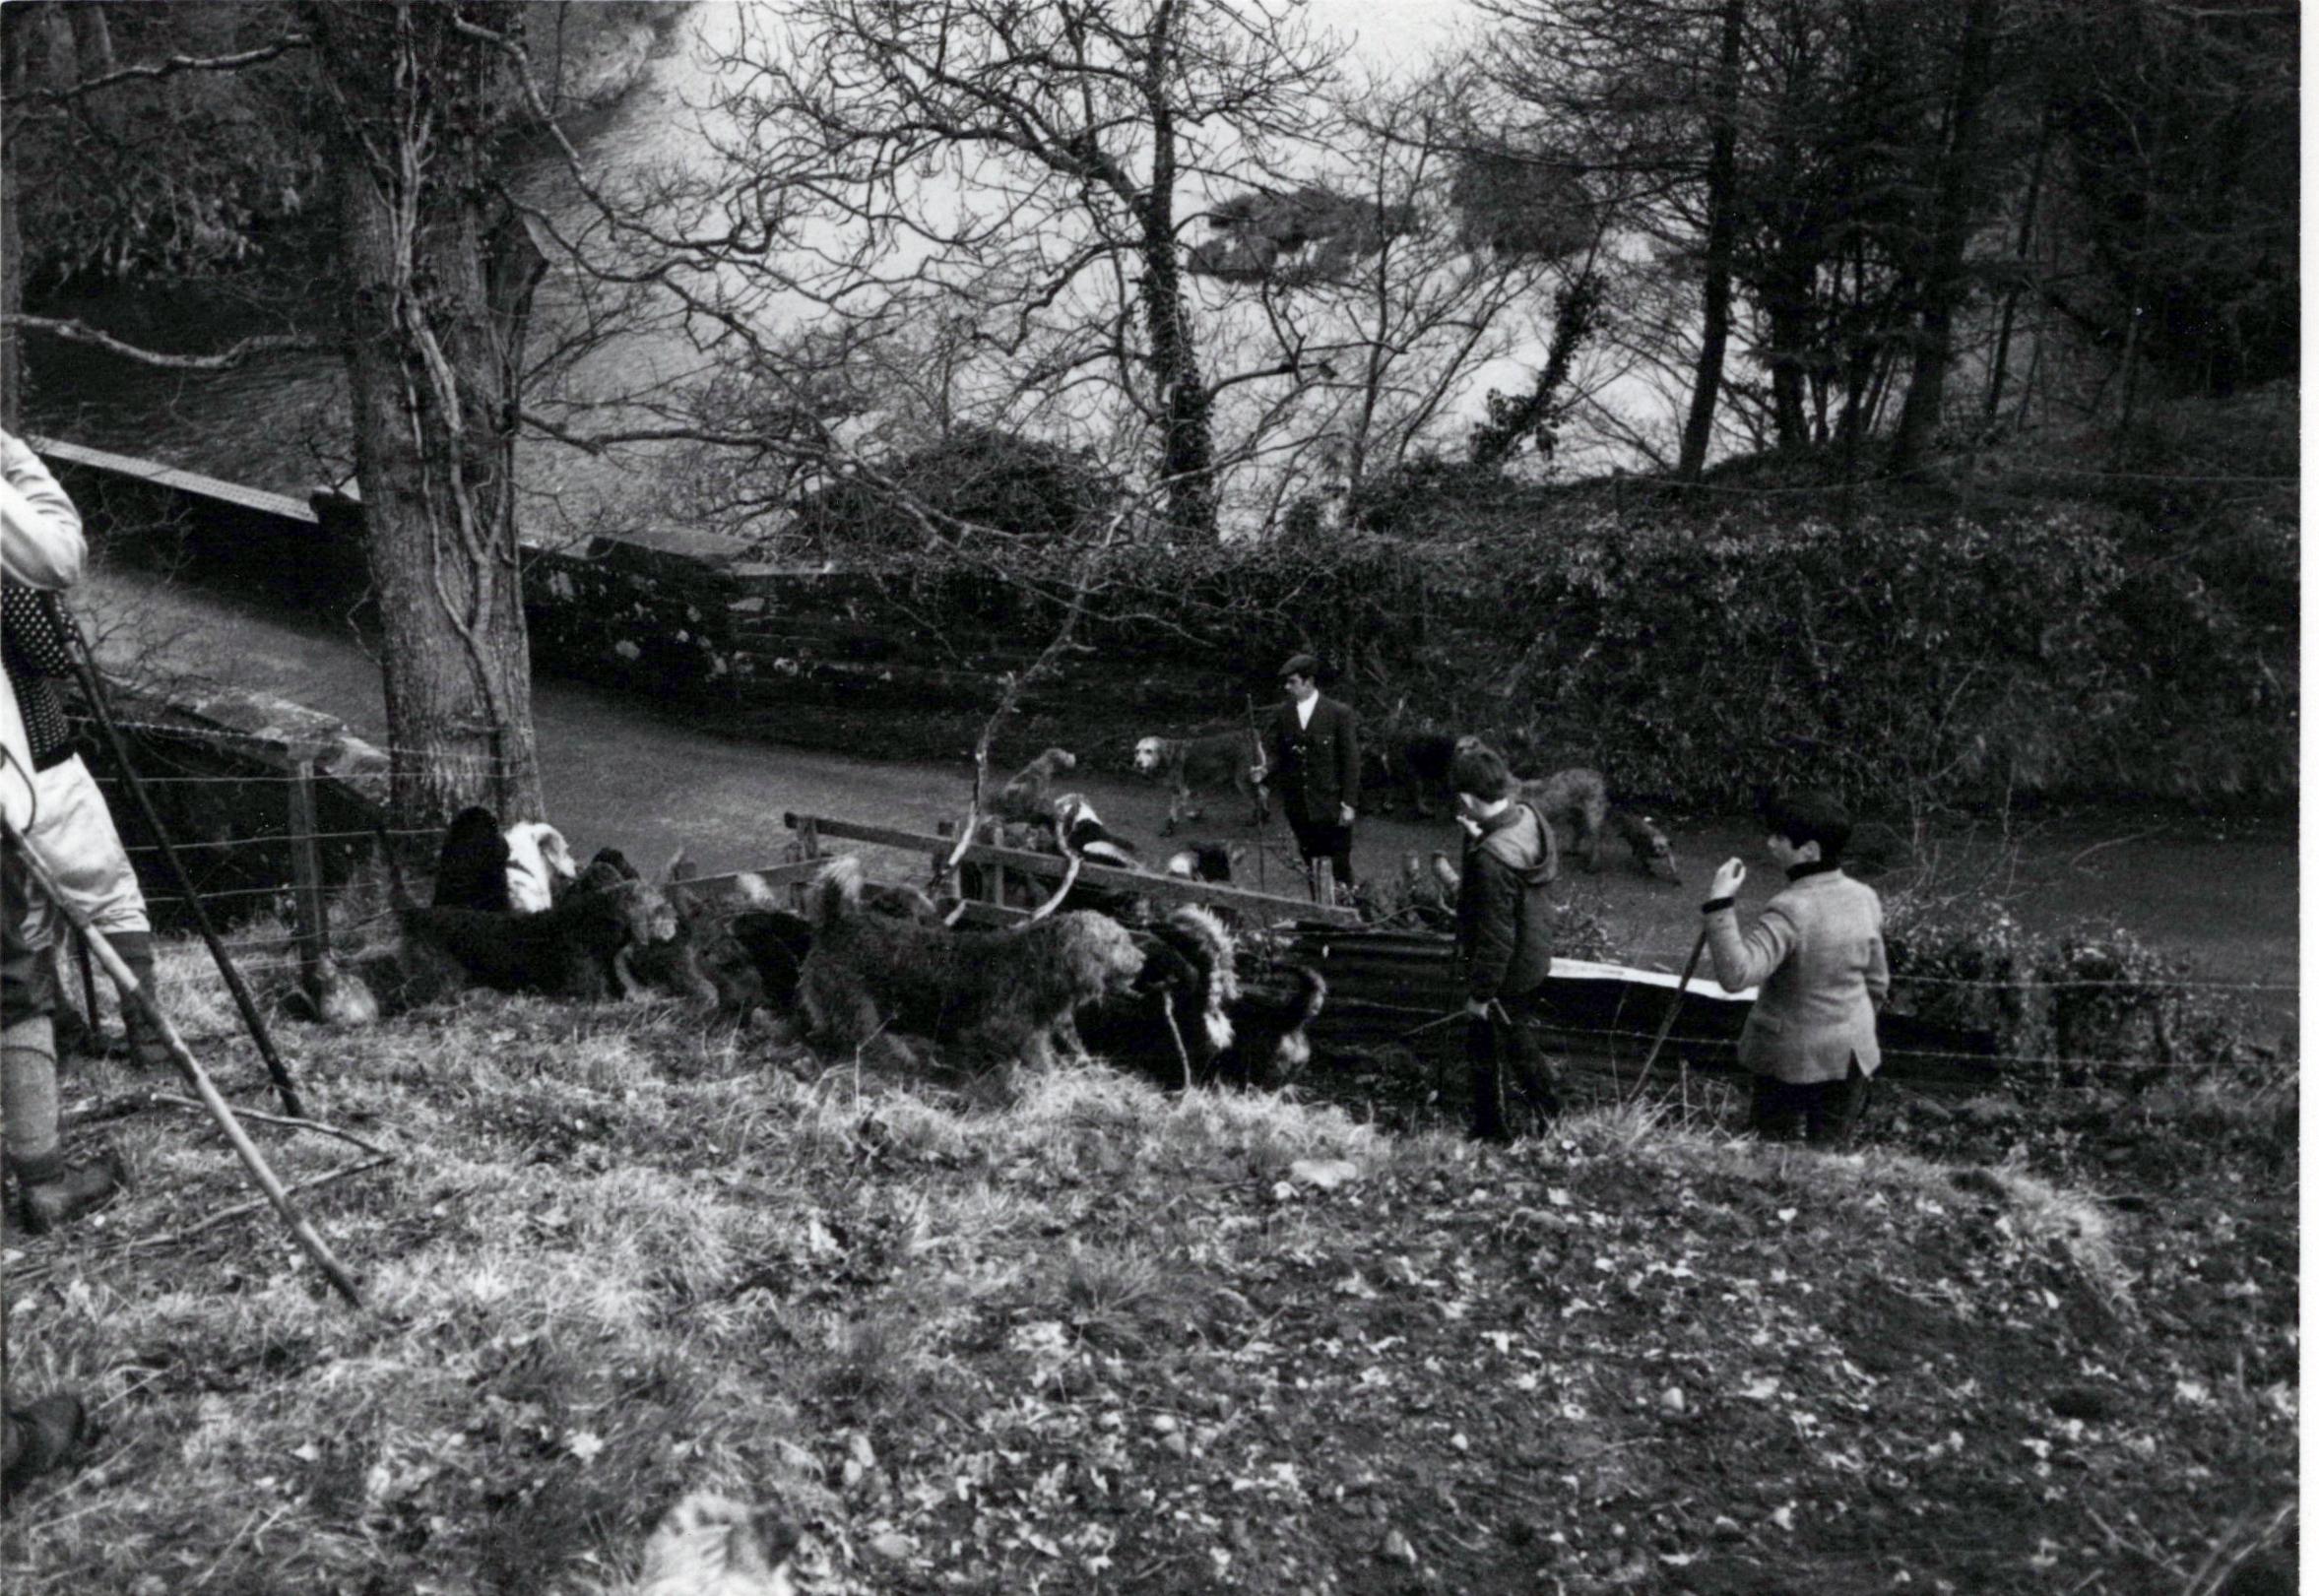 1970_Mei_Otterhound-Schotland_0004_a